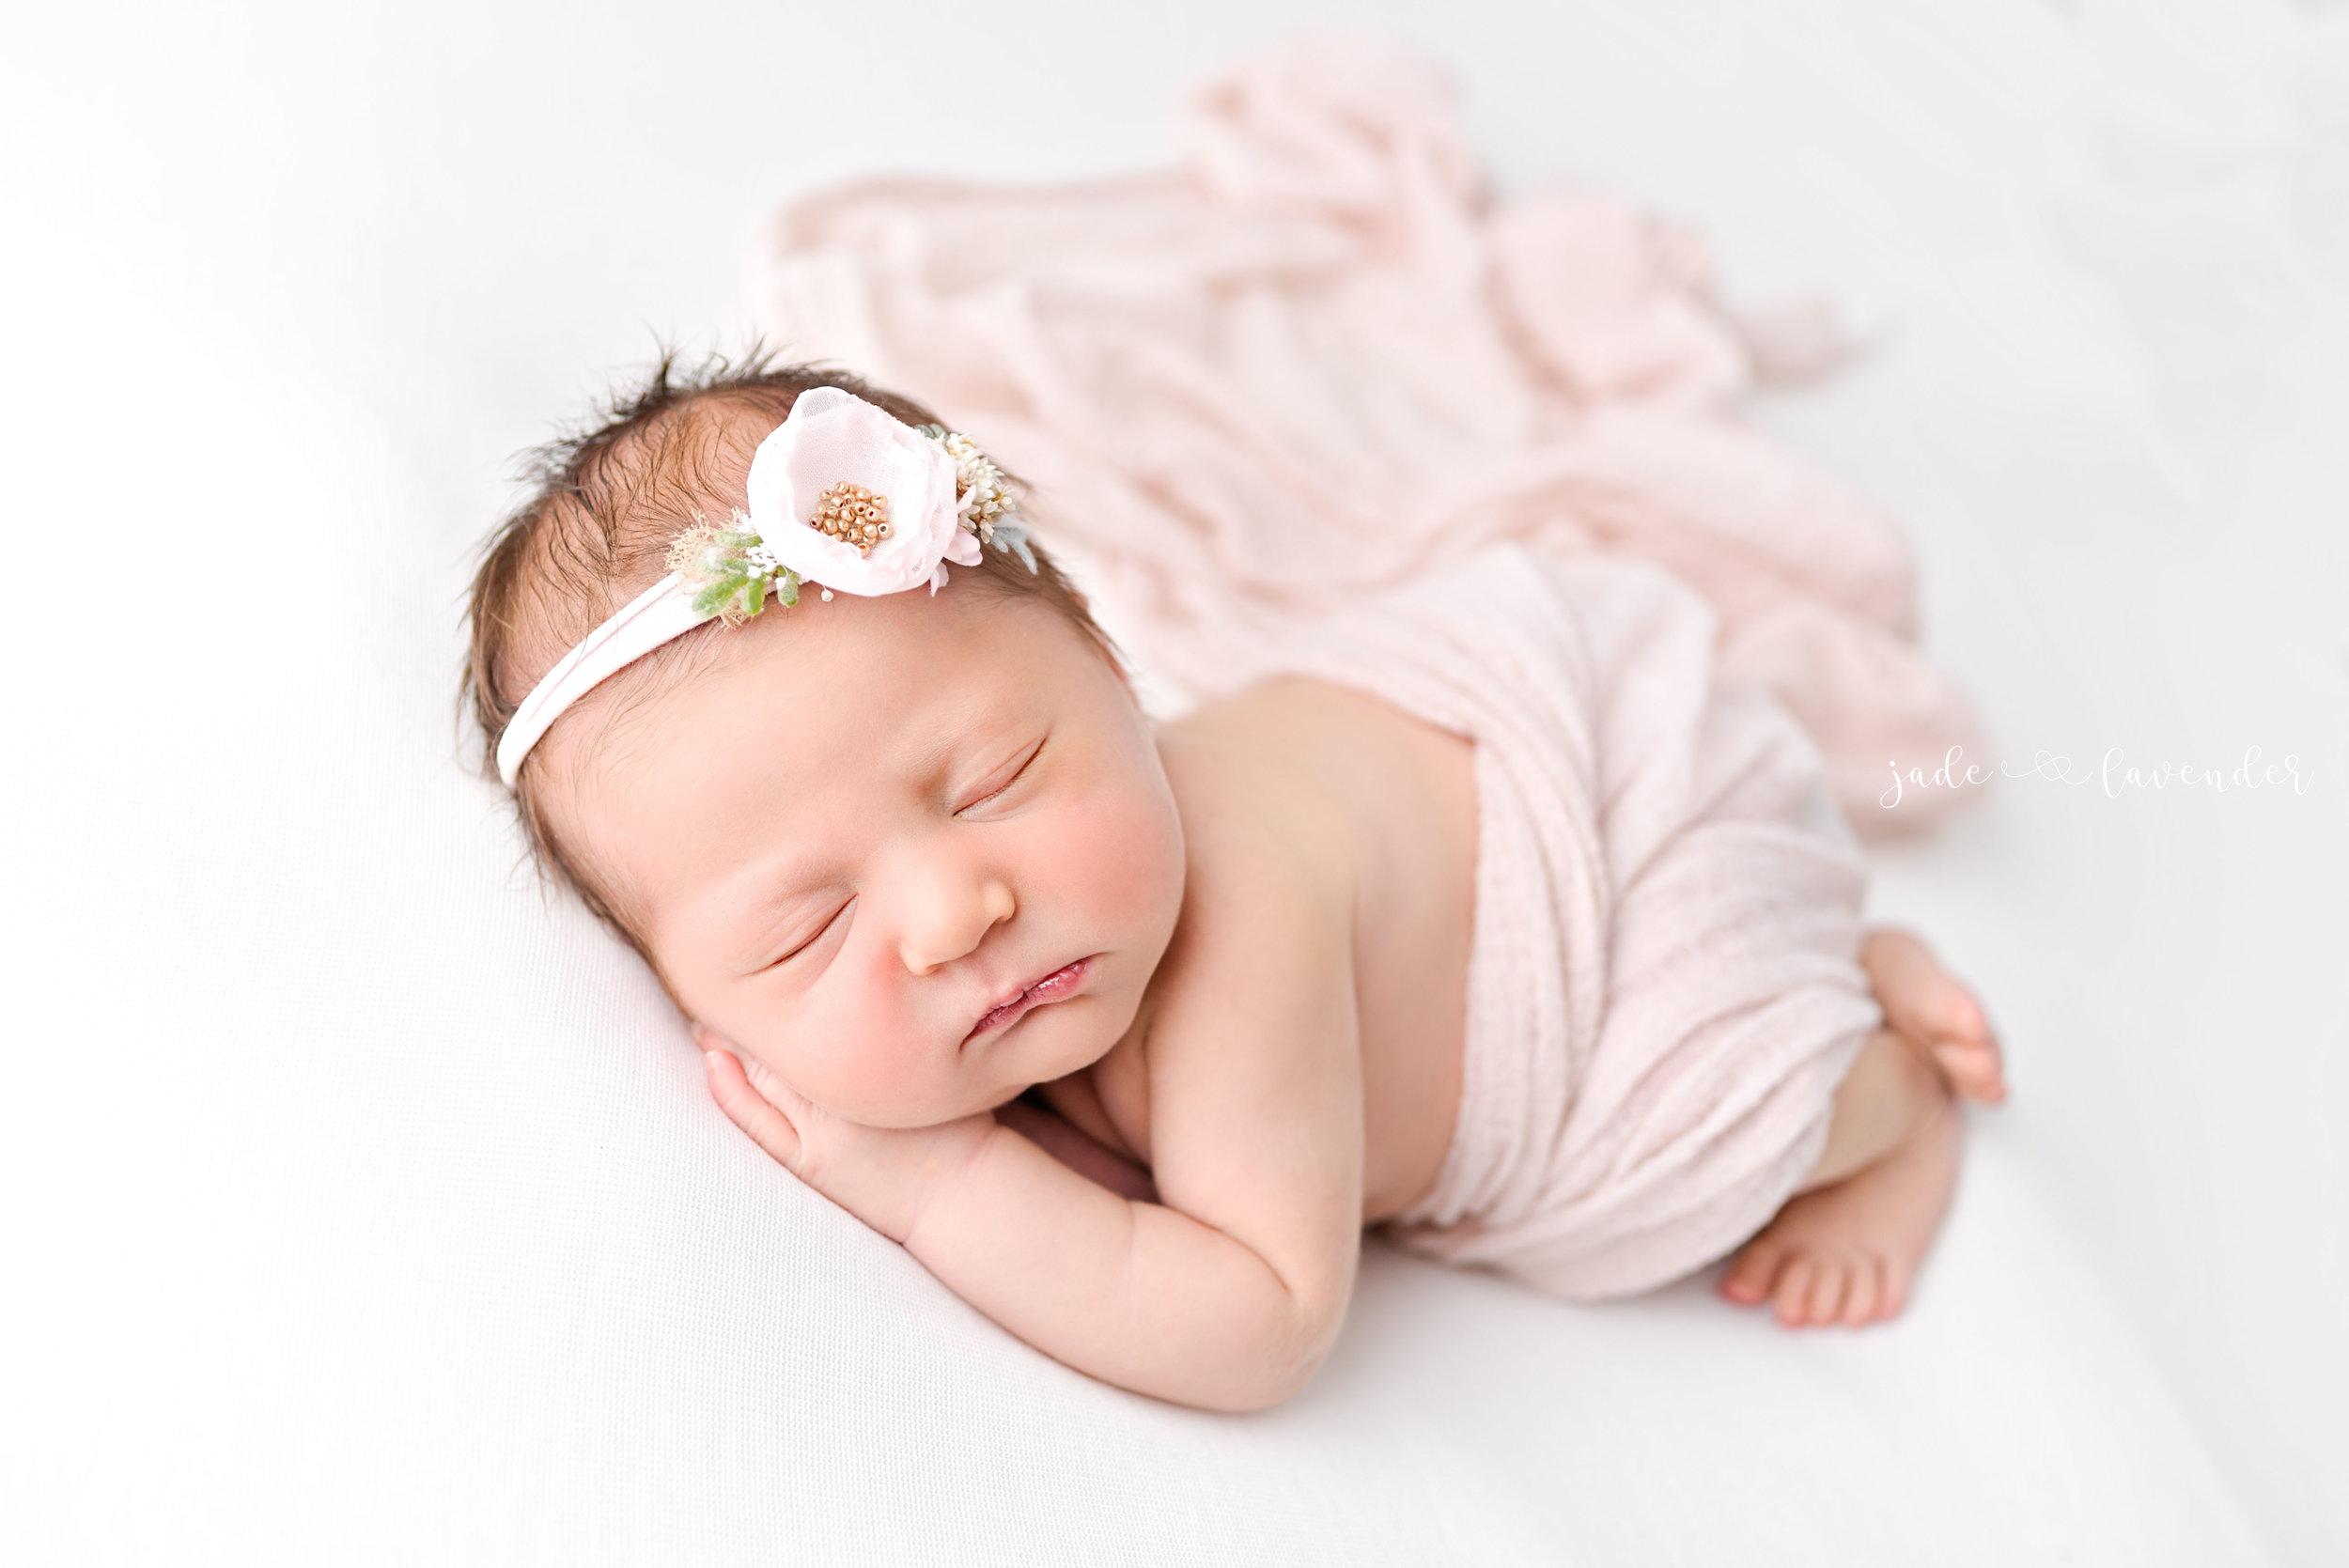 Baby-girl-pink-newborn-photography-infant-images-baby-photos-photographer-spokane-washington (2 of 8).jpg